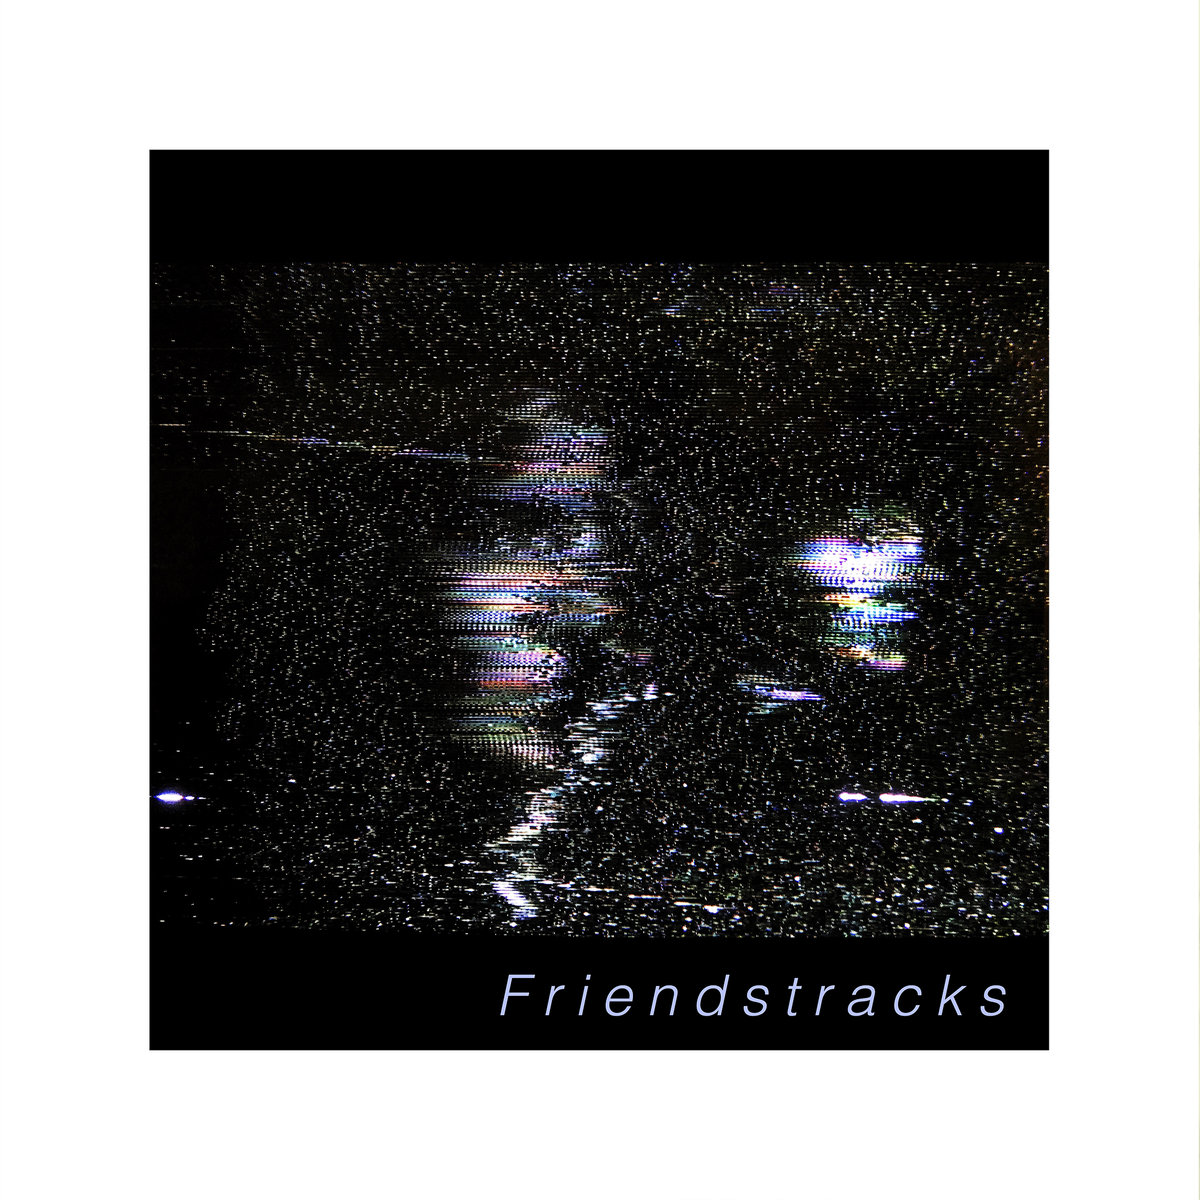 Friendstracks